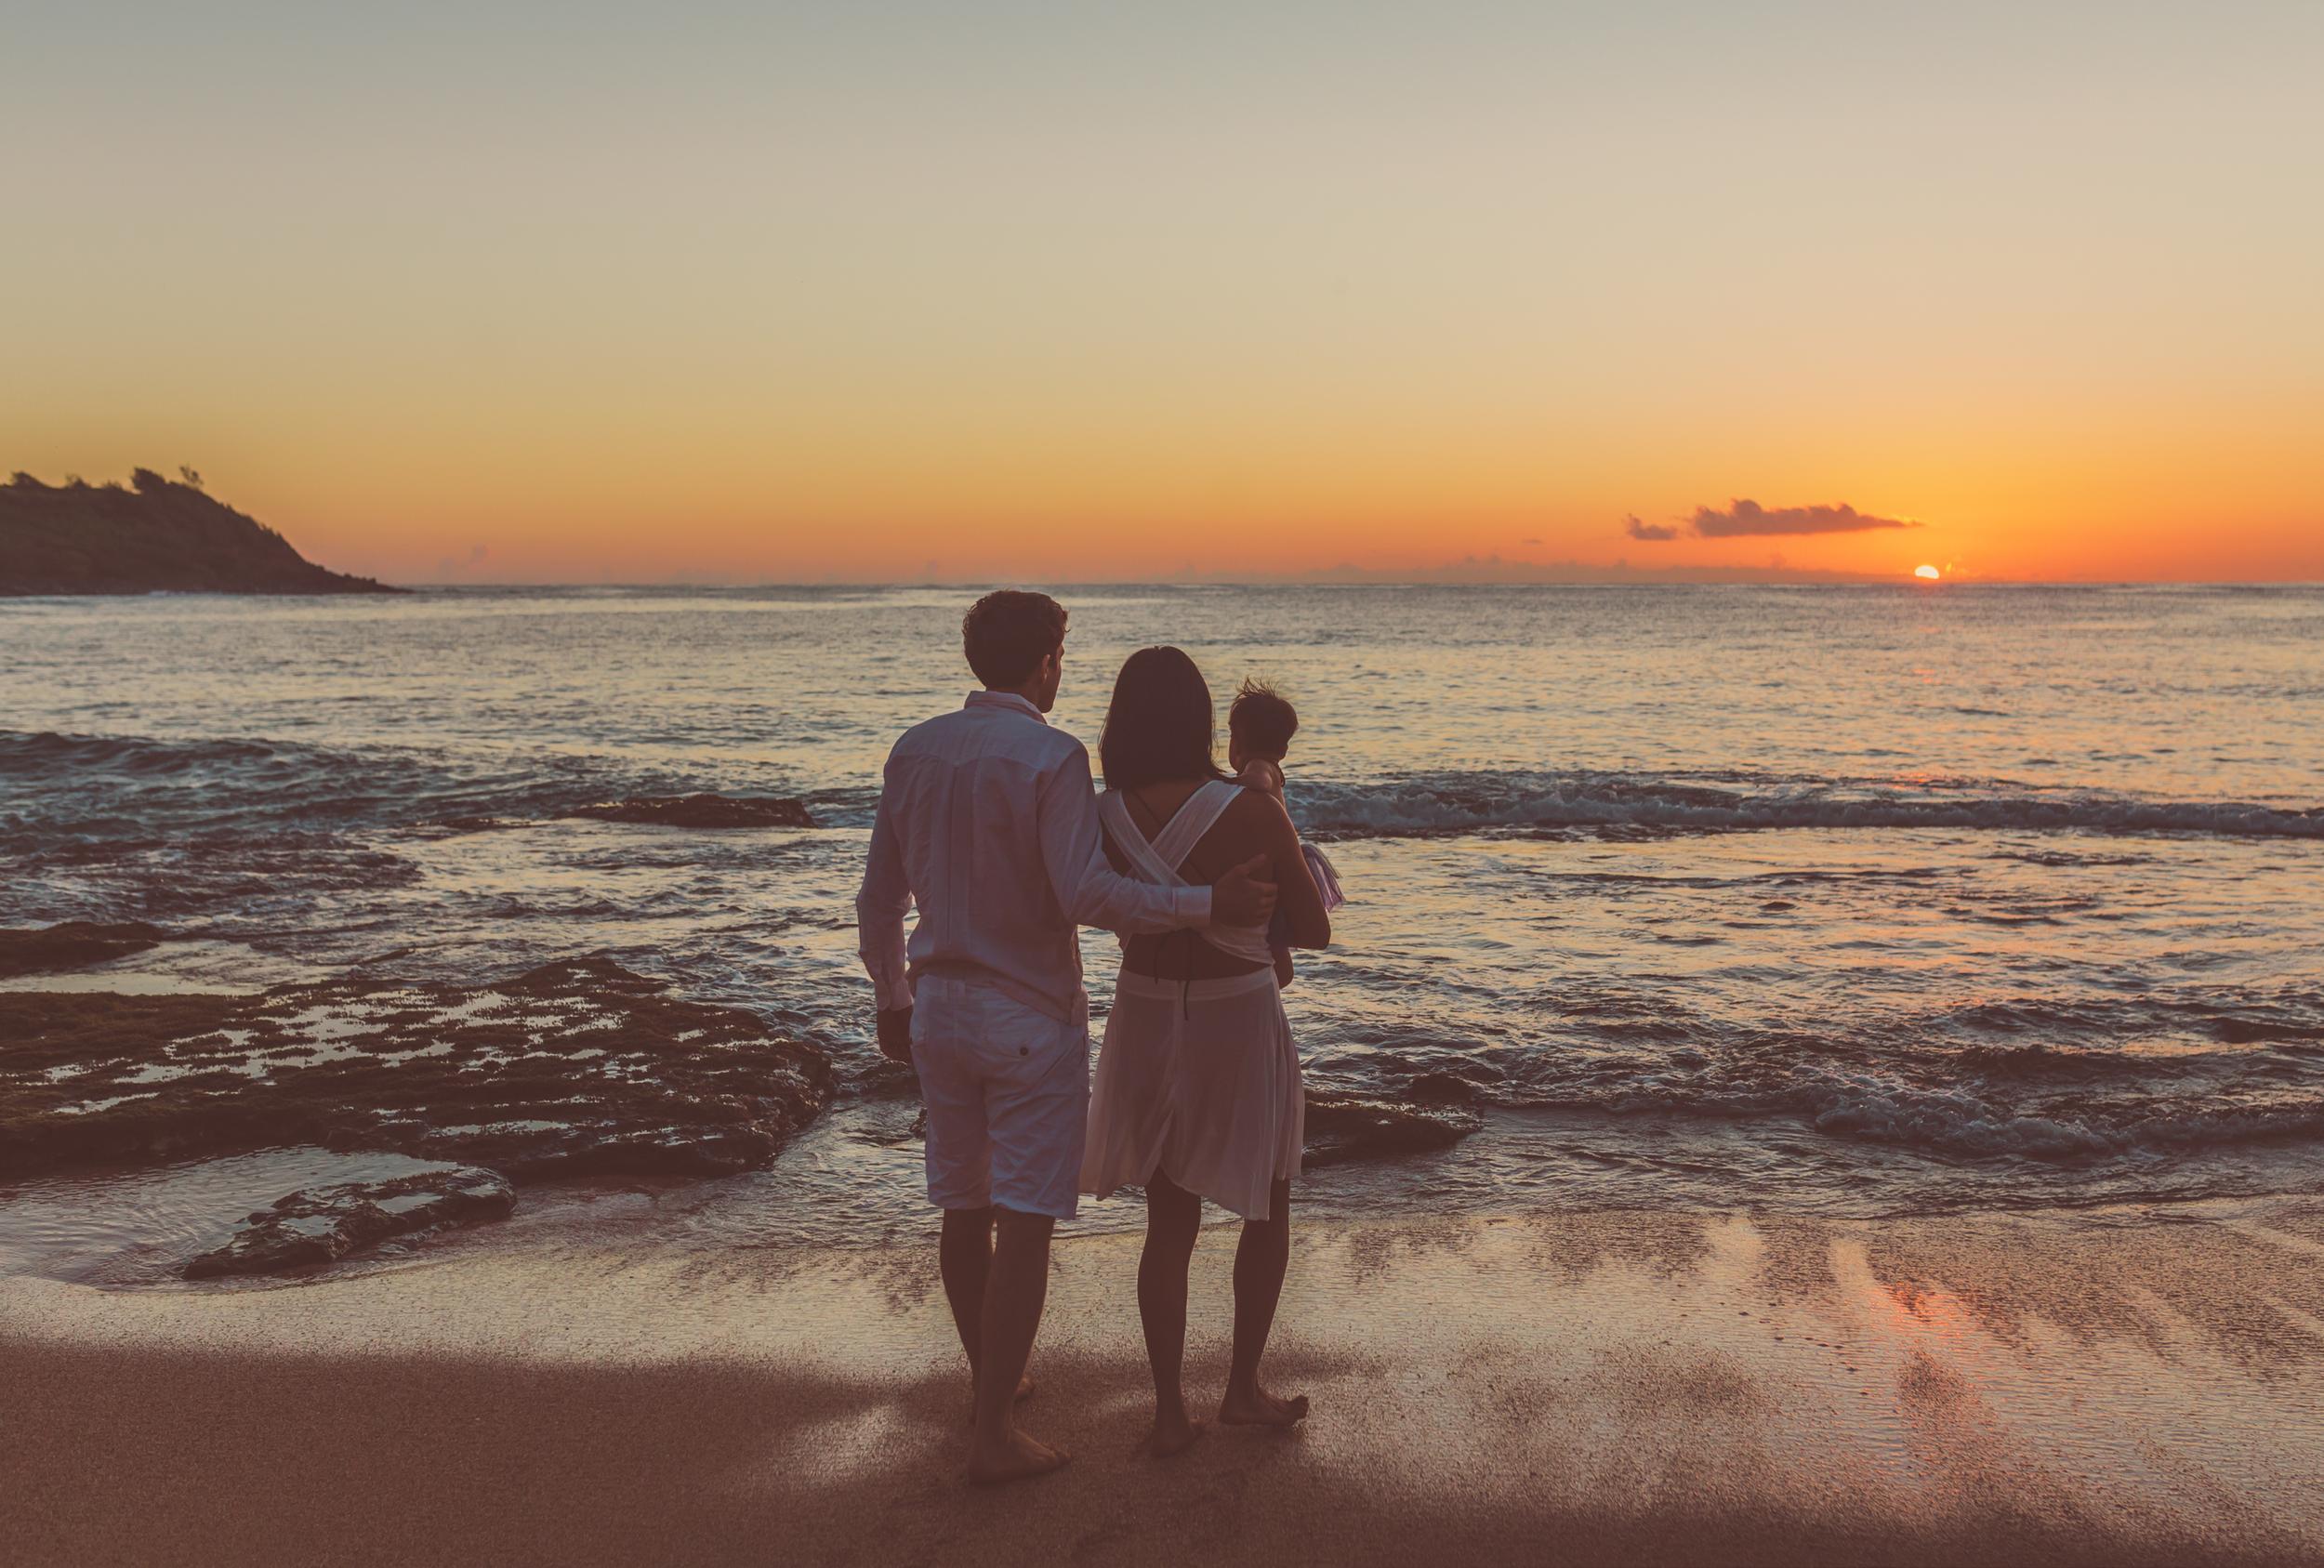 kauai wedding photographer, jennifer picard photographer, kauai family sunrise photos